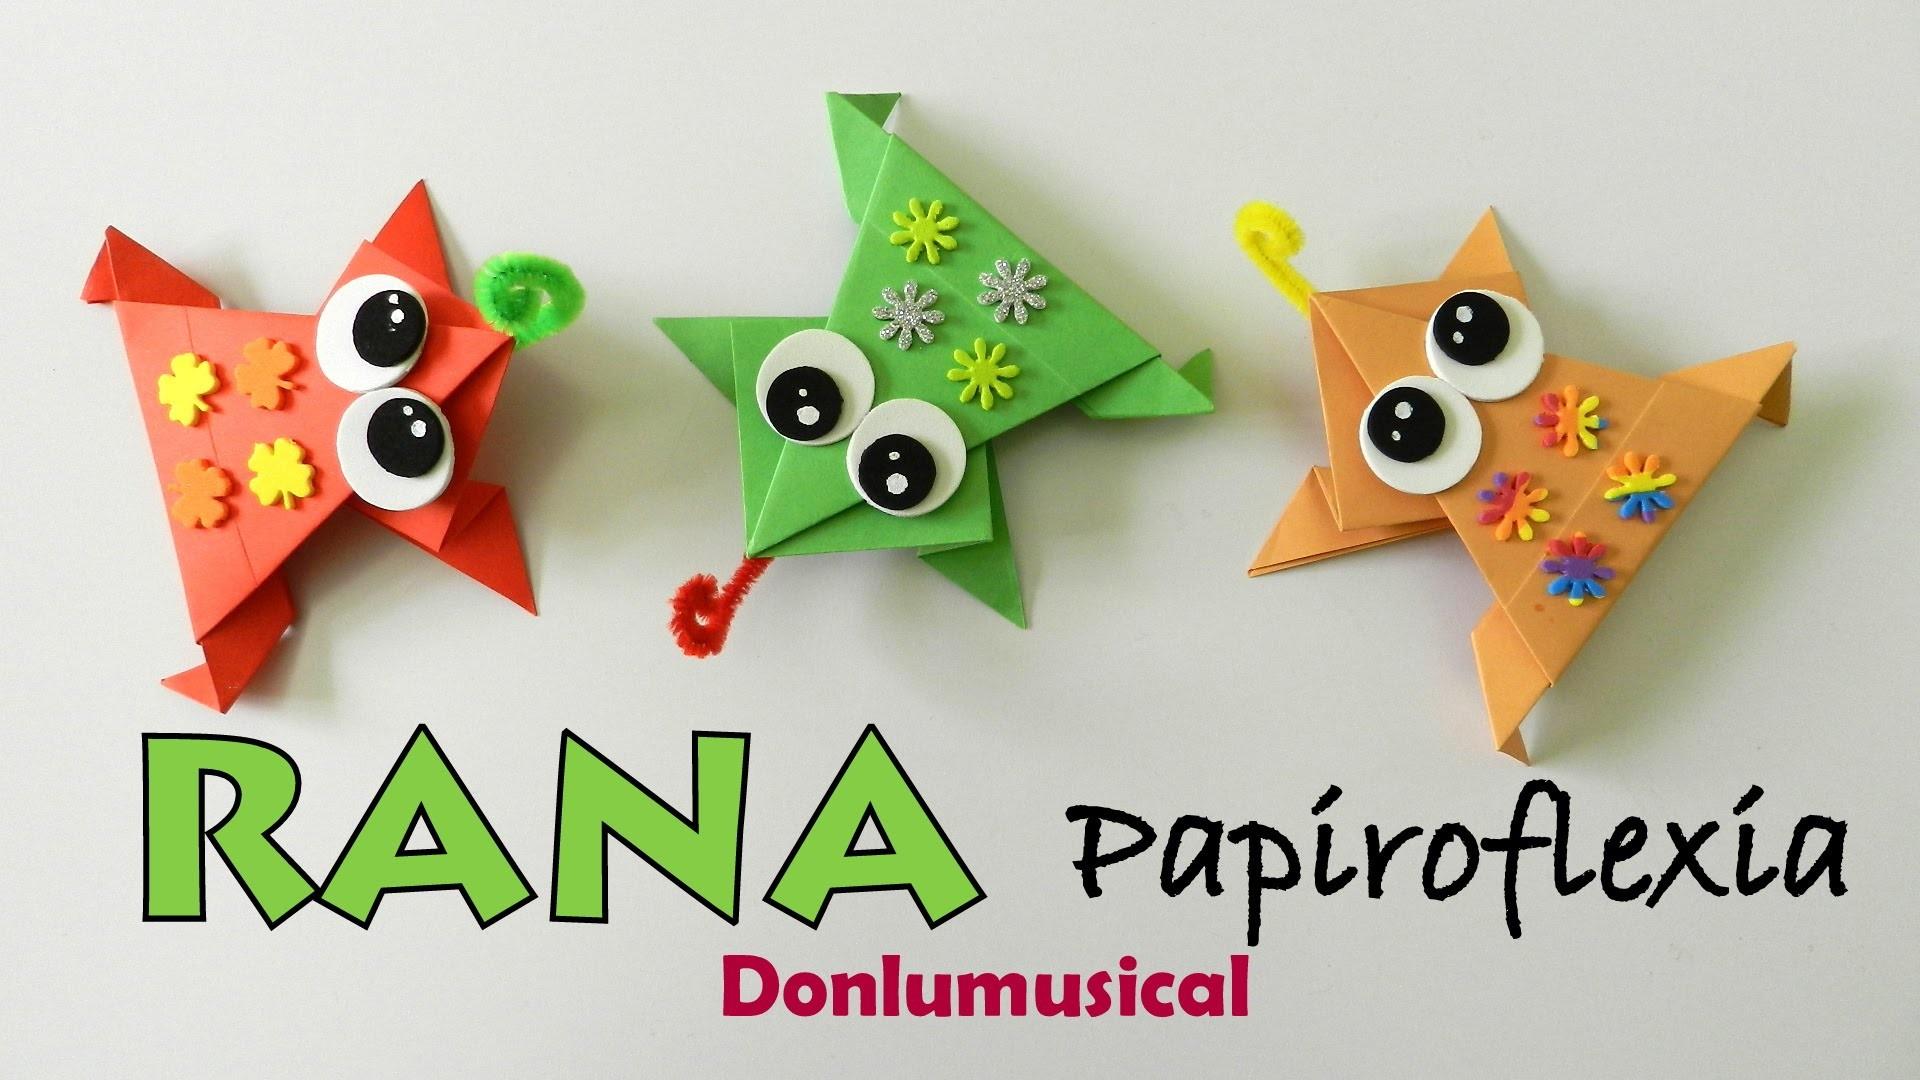 RANA FÁCIL. Papiroflexia. Origami. Manualidades.